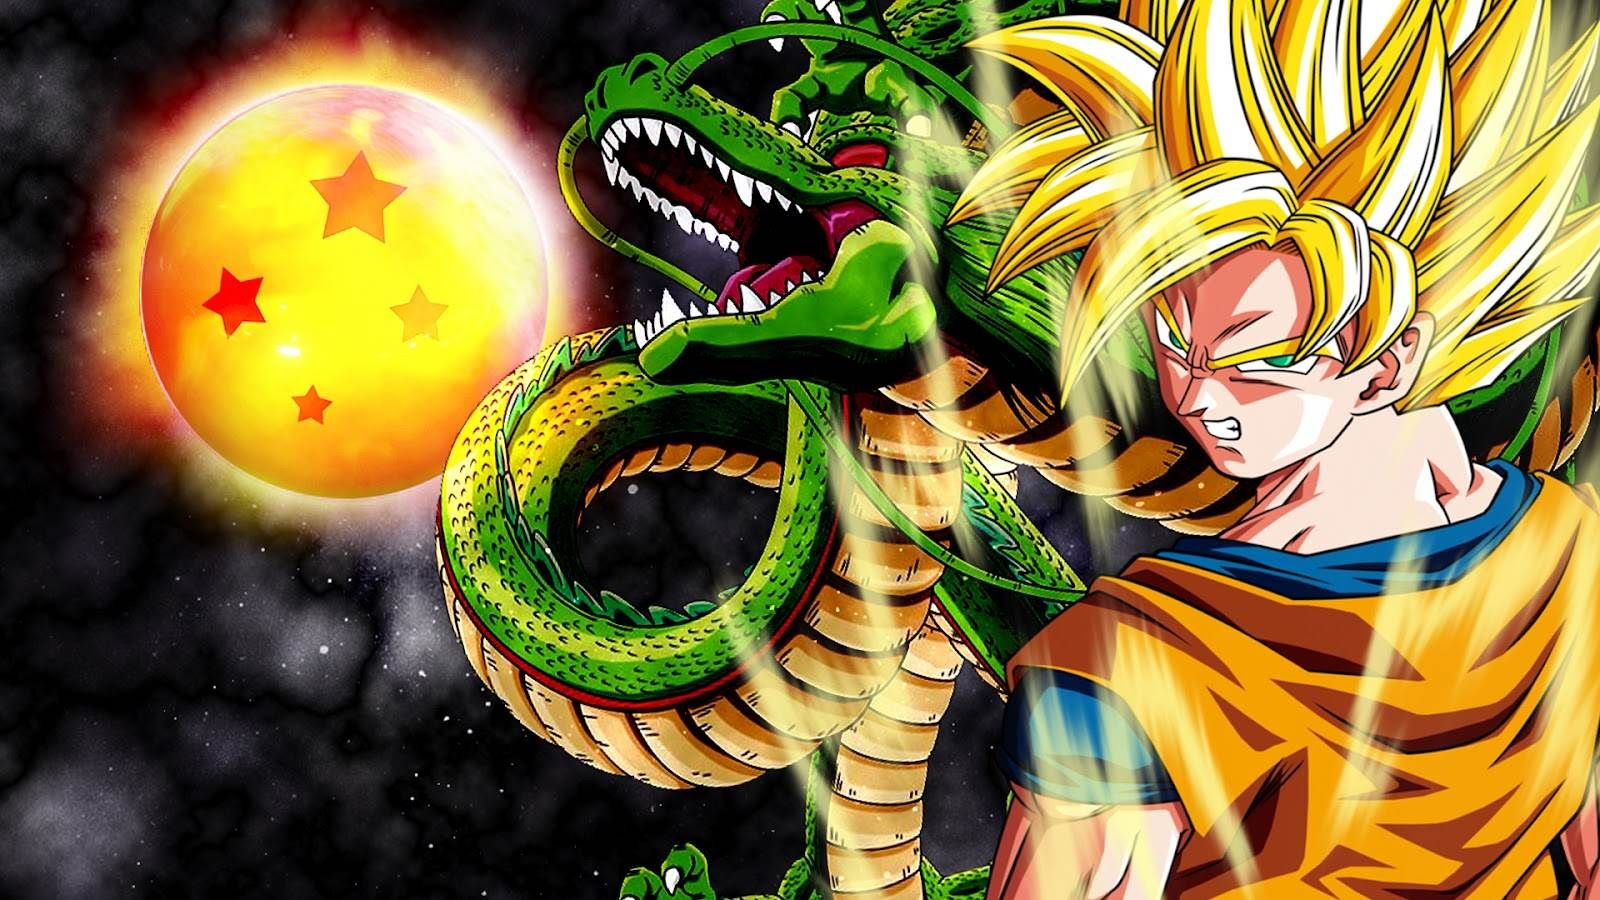 Goku Super Saiyan Wallpaper 1920x1080 4 HD Wallpapers